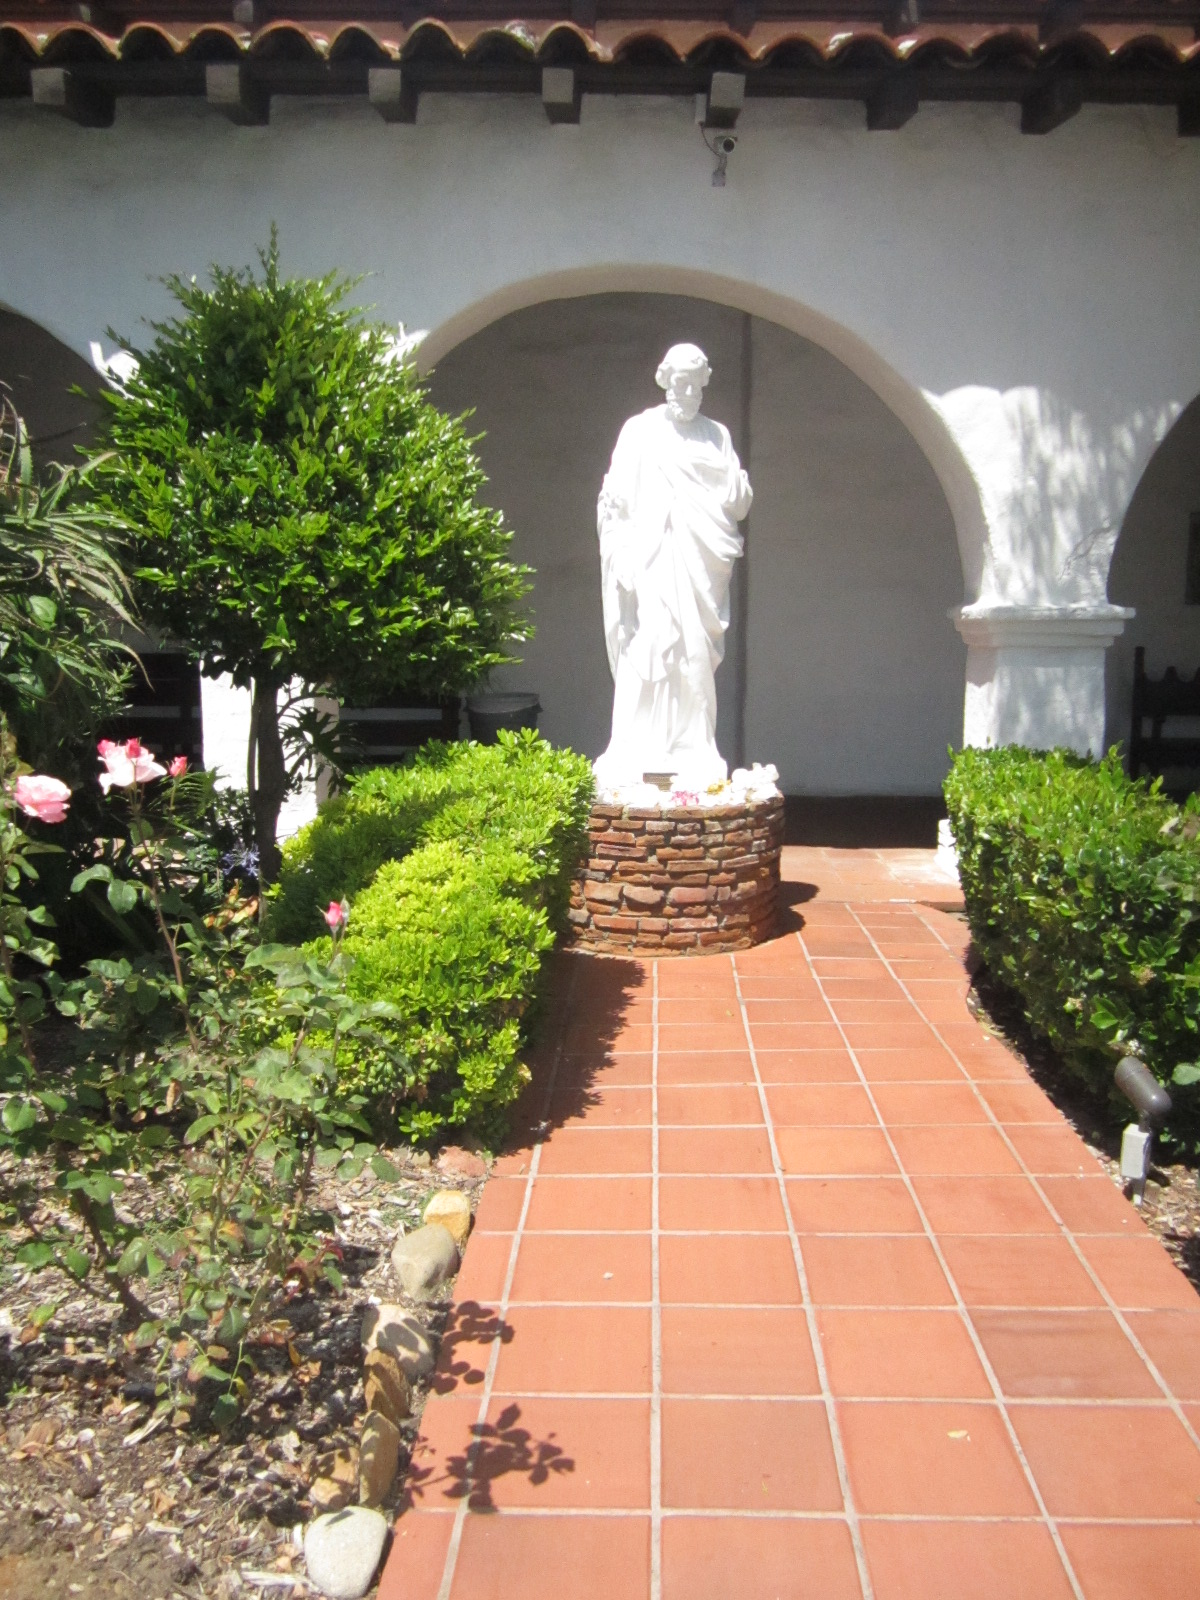 Ciao Newport Beach The Mission San Diego De Alcala Gardens